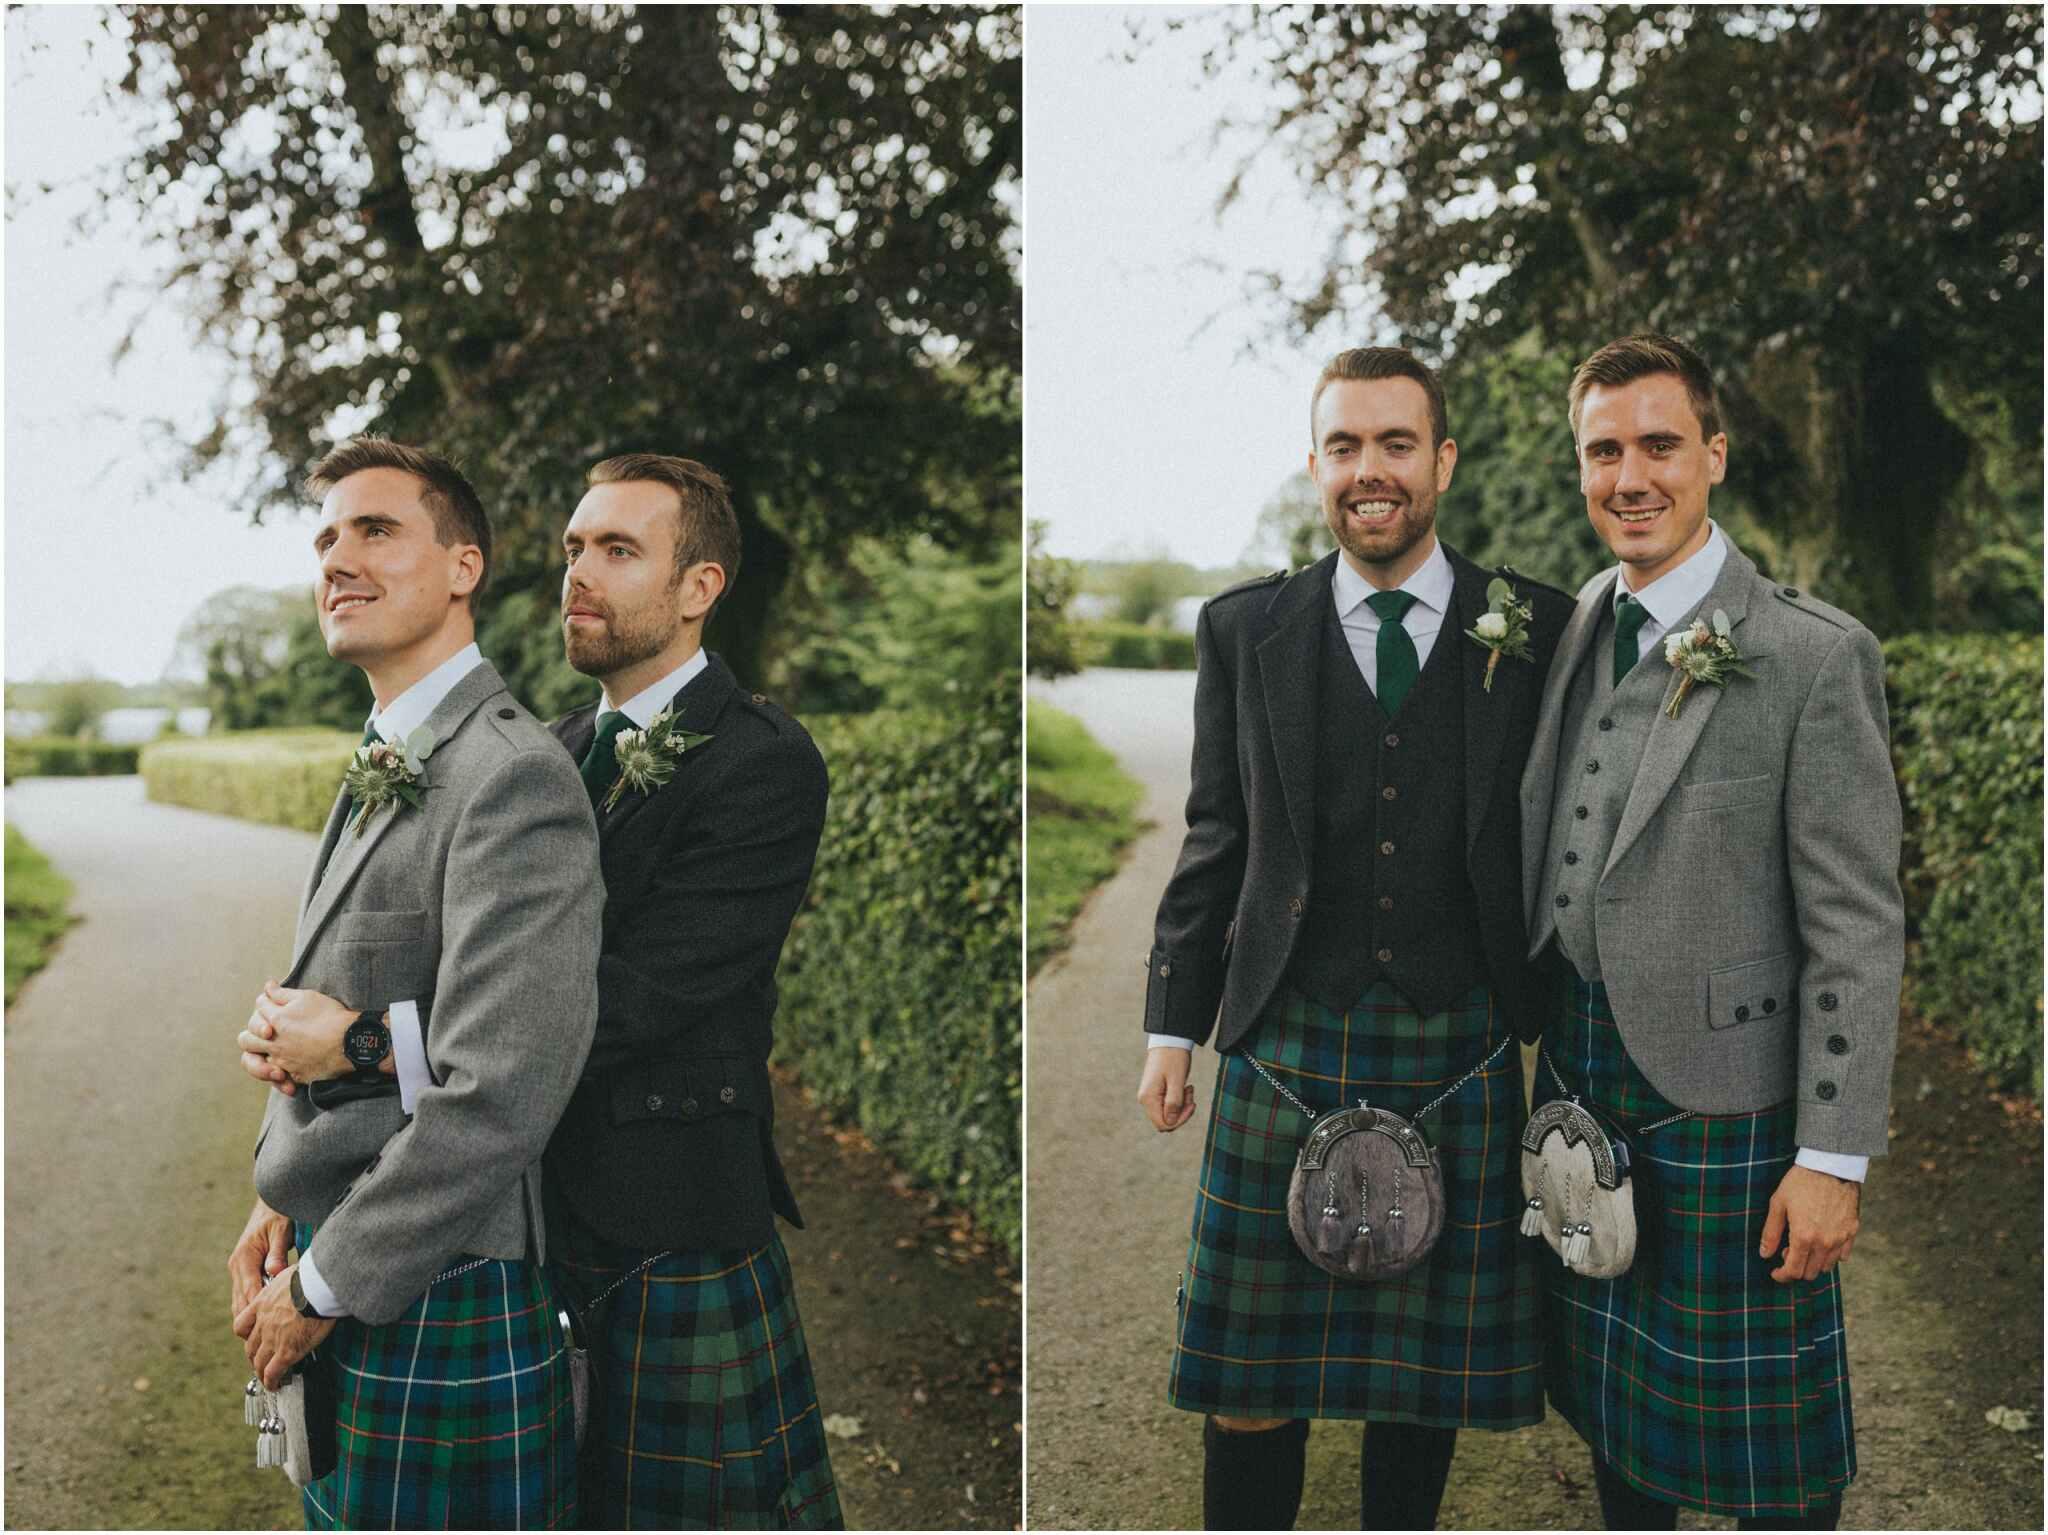 Fionnuala + Paul - Mount Druid Alternative Wedding 47